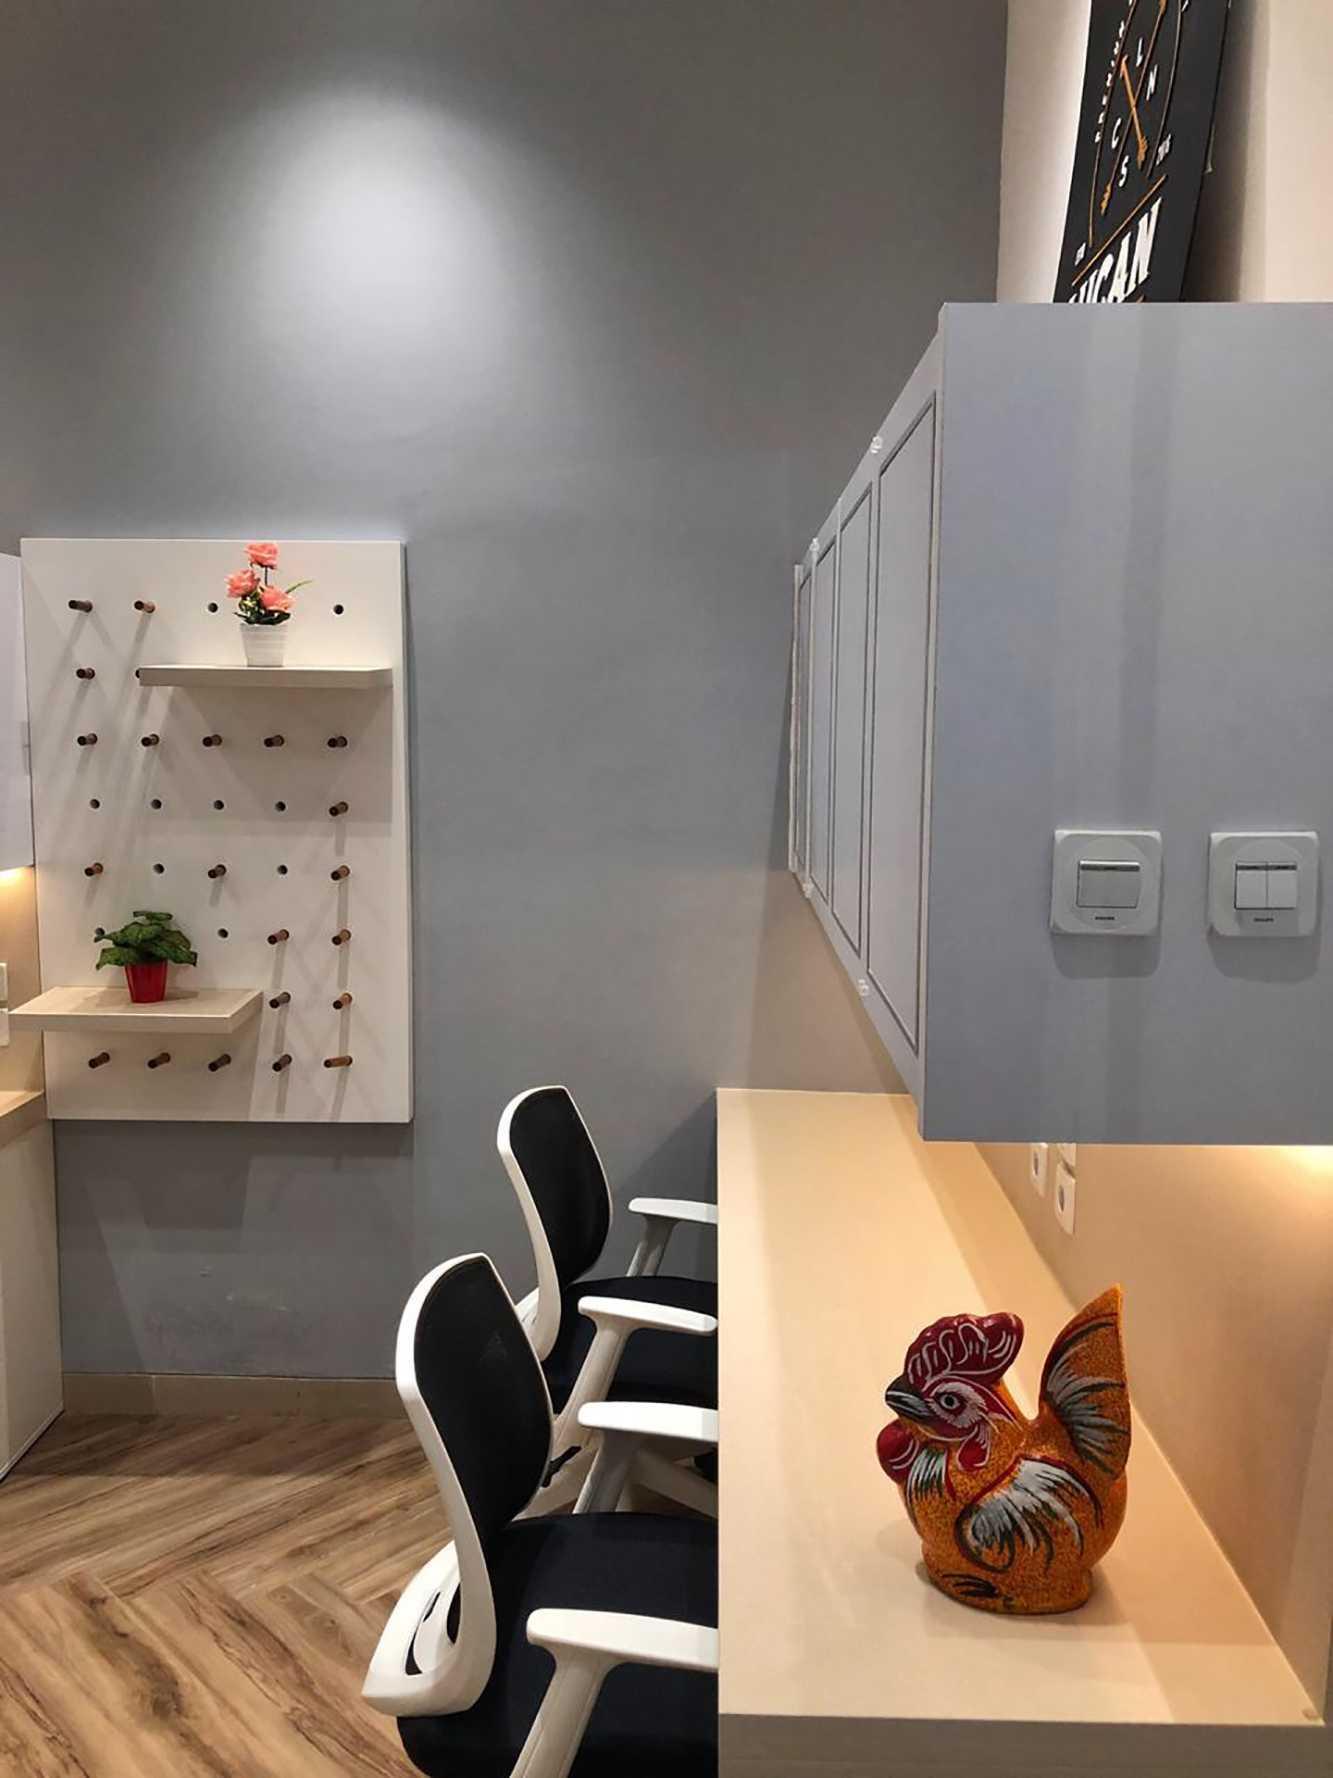 Imelda Small Office For Lucan Shop Serpong, Kota Tangerang Selatan, Banten, Indonesia Serpong, Kota Tangerang Selatan, Banten, Indonesia Imelda-Small-Office-For-Lucan-Shop  67418